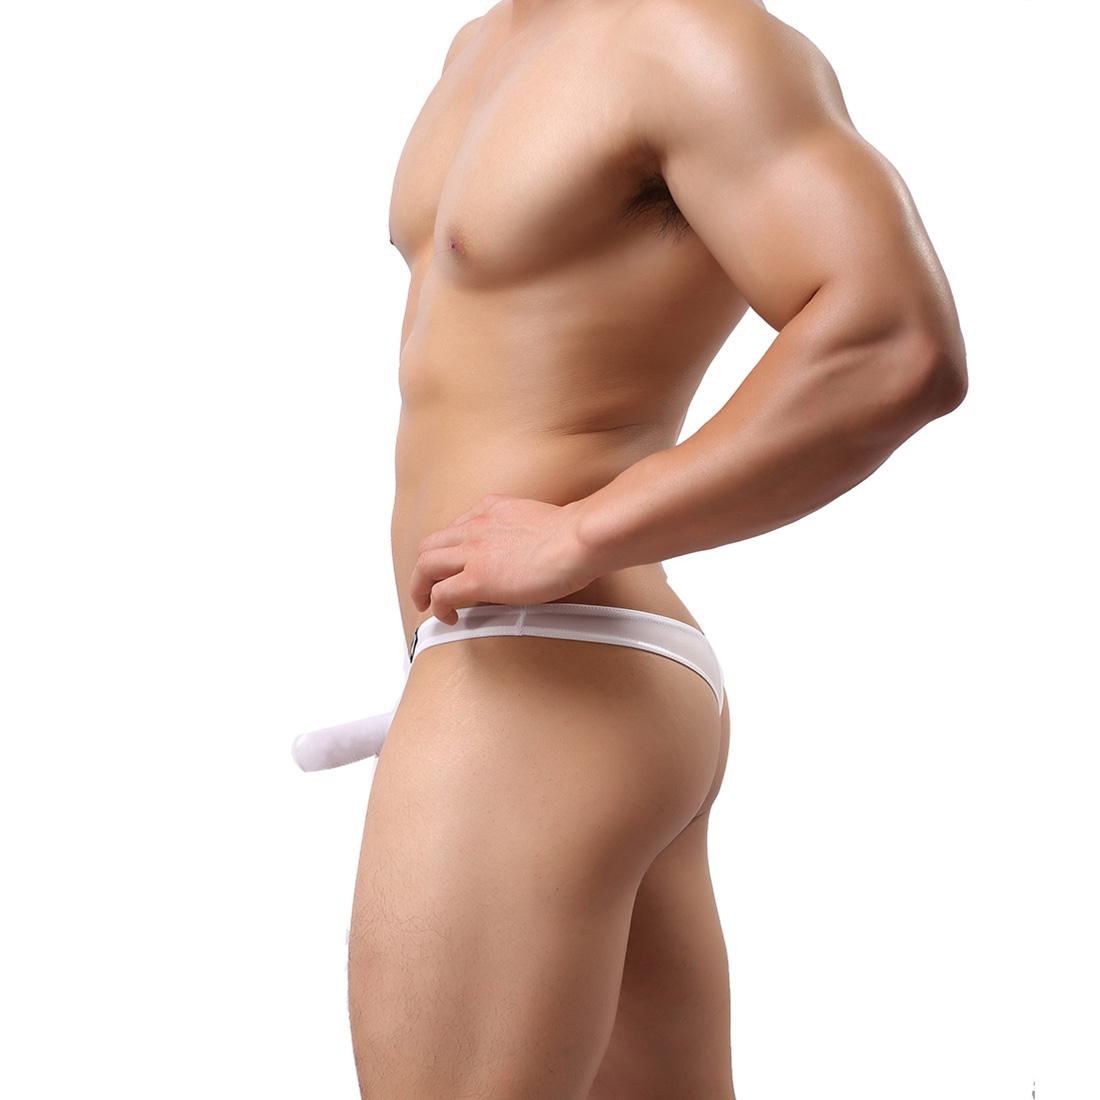 Penis Sheath Underwear 67